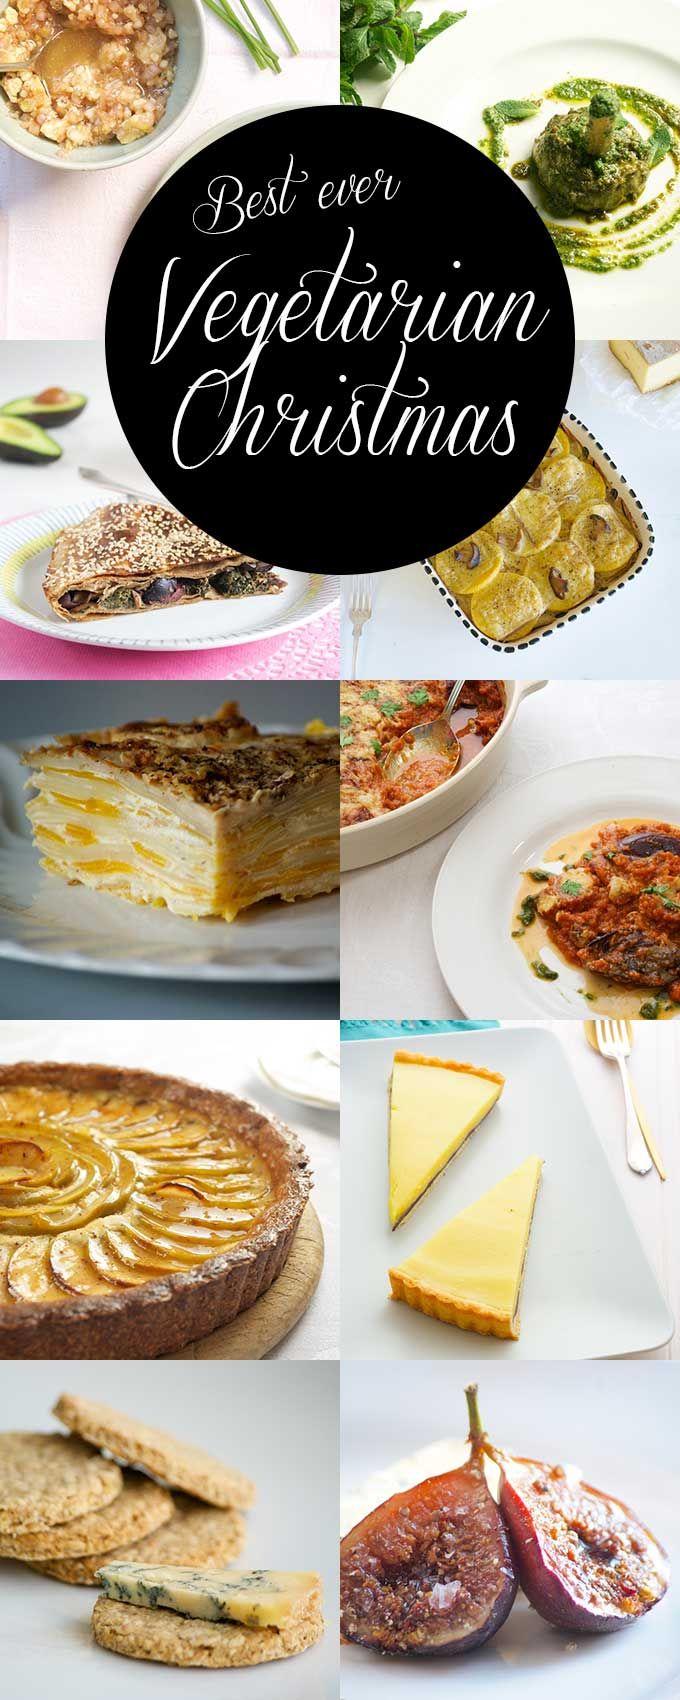 Vegetarian Christmas Recipes Round-Up - includes dessert options   ramsonsandbramble.com